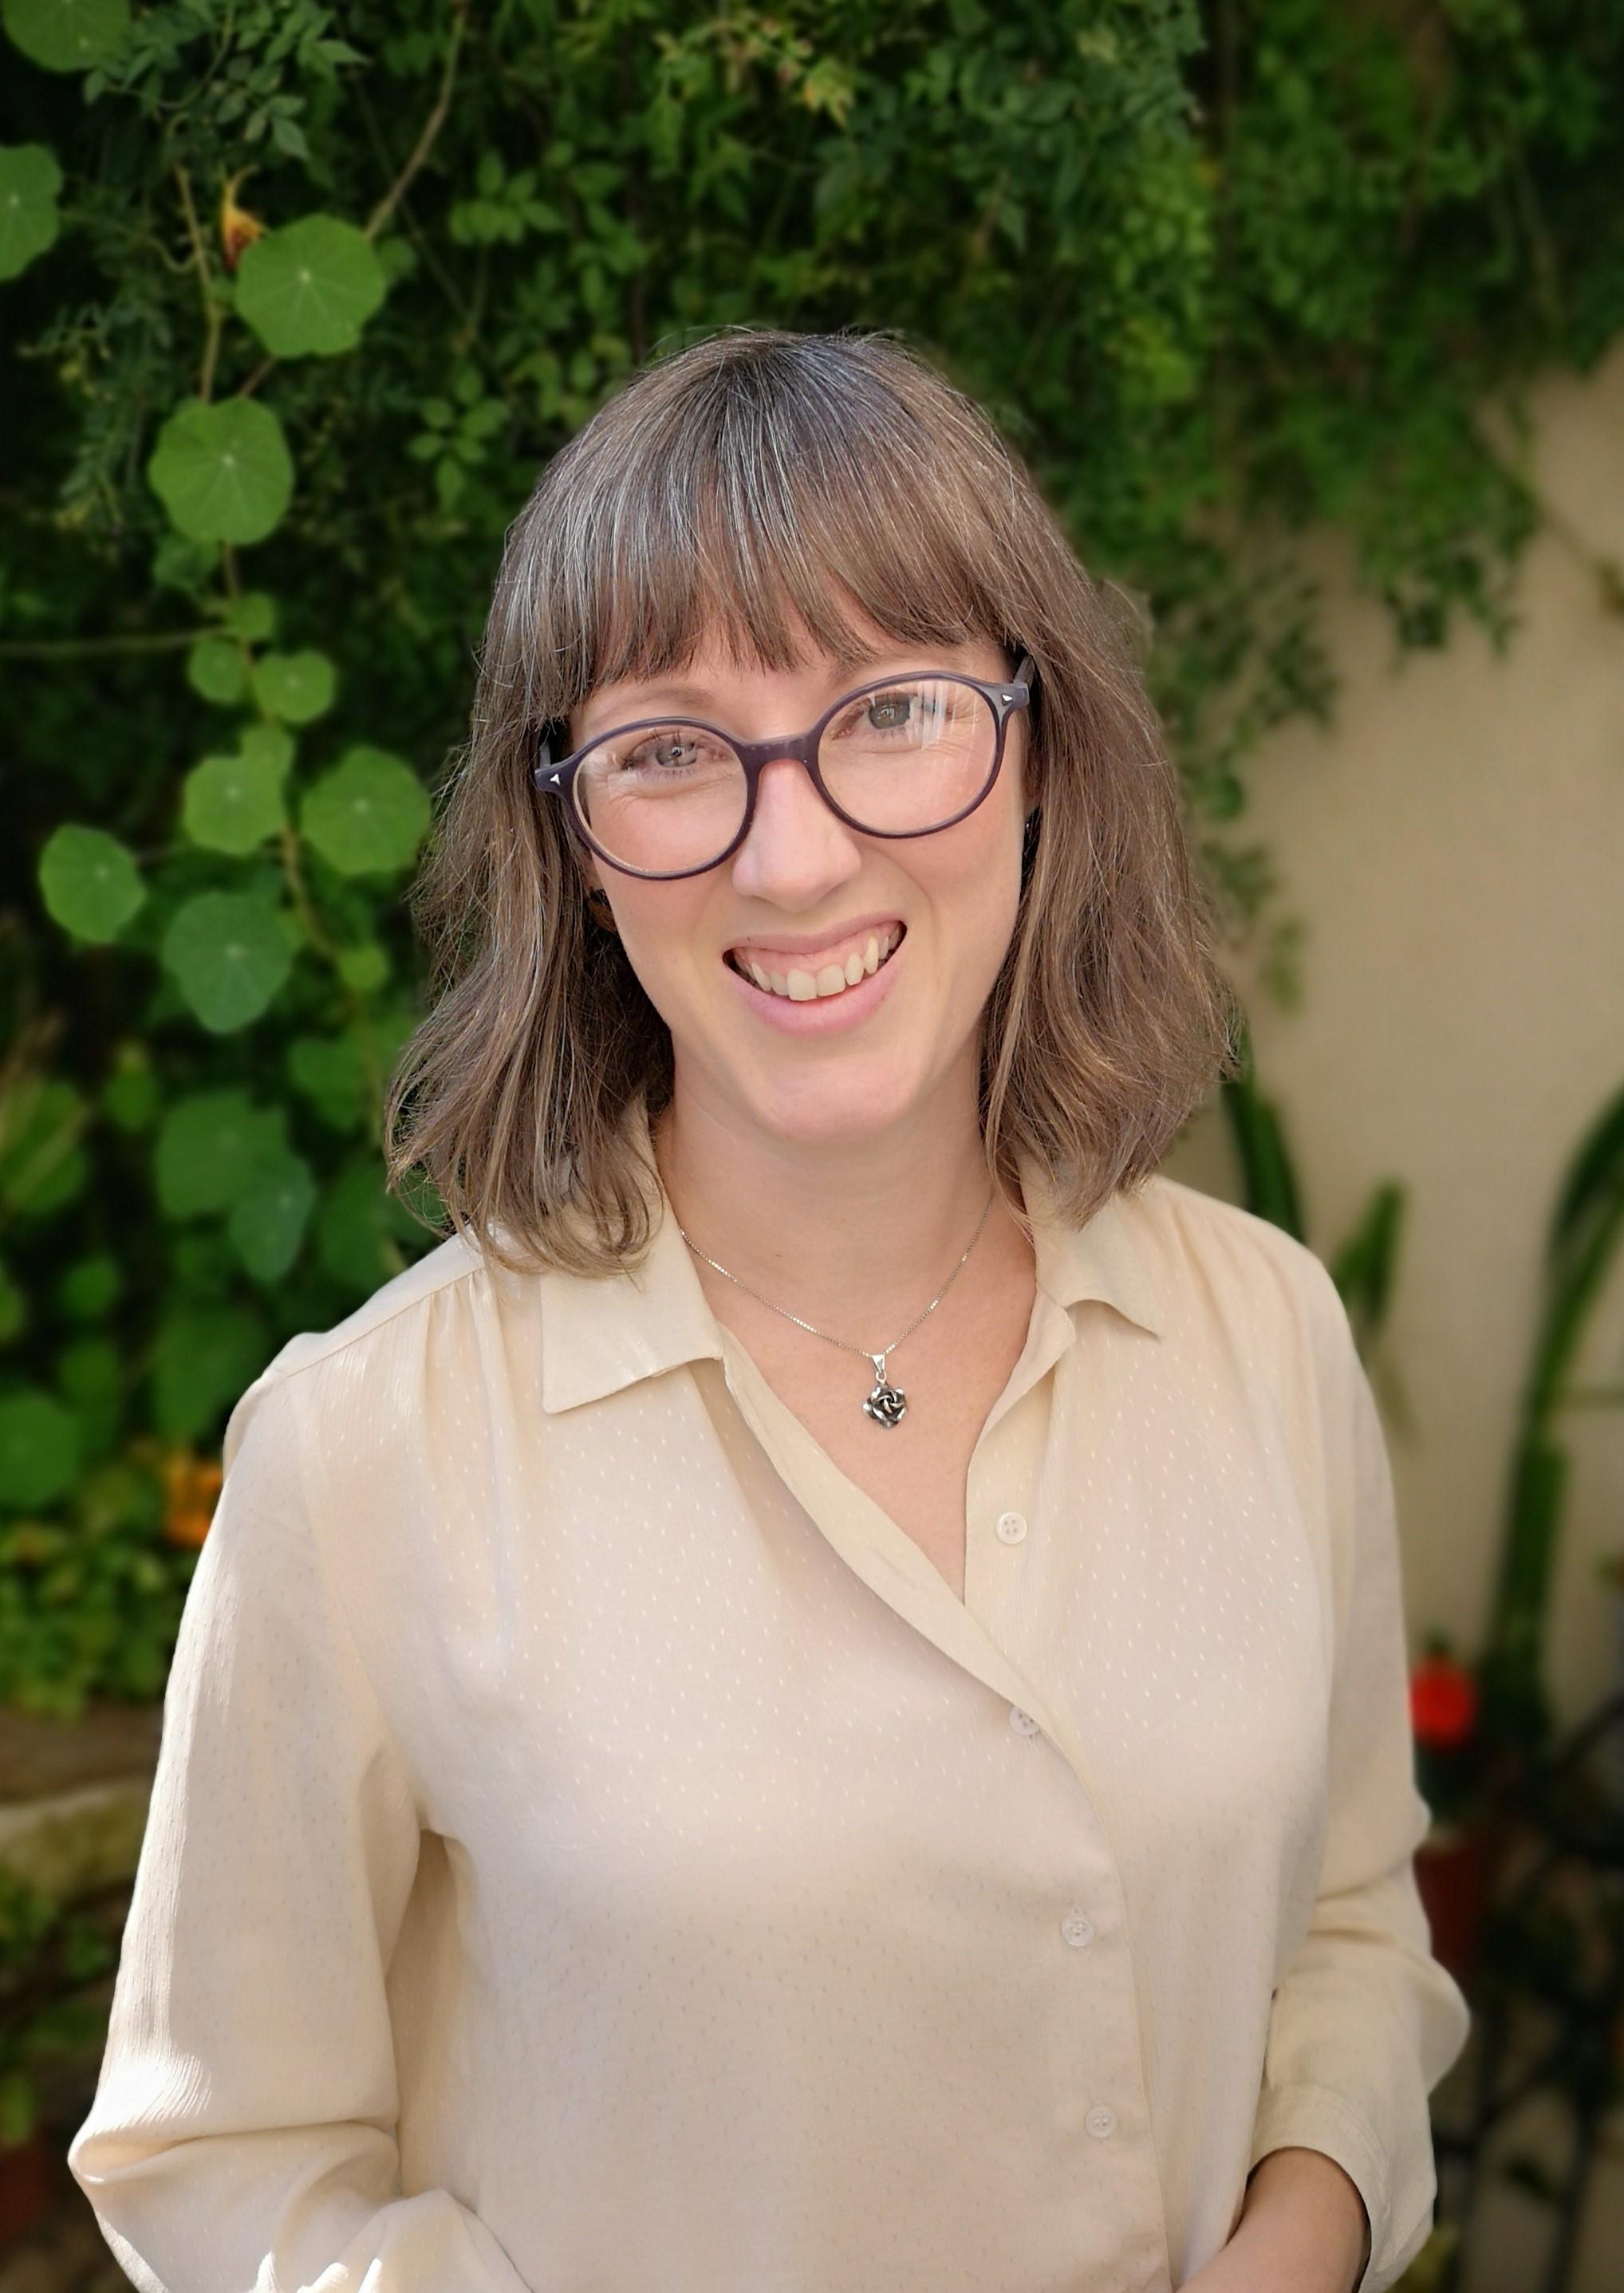 Charlotte Holworthy